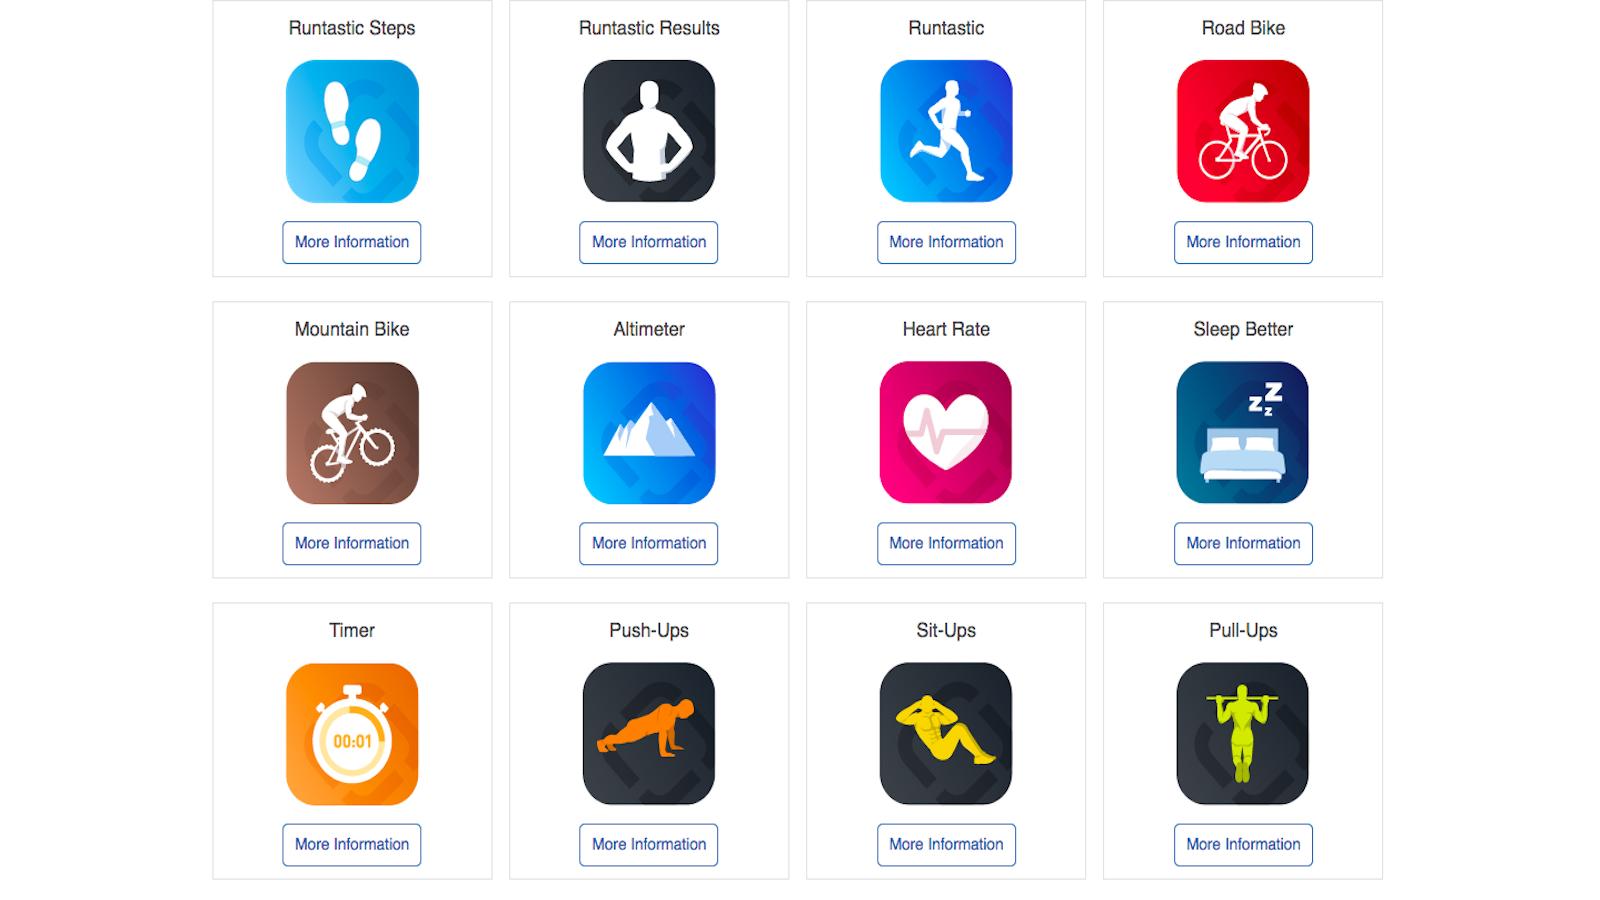 Best-Fitness-Apps-of-2018-Runtastic-App